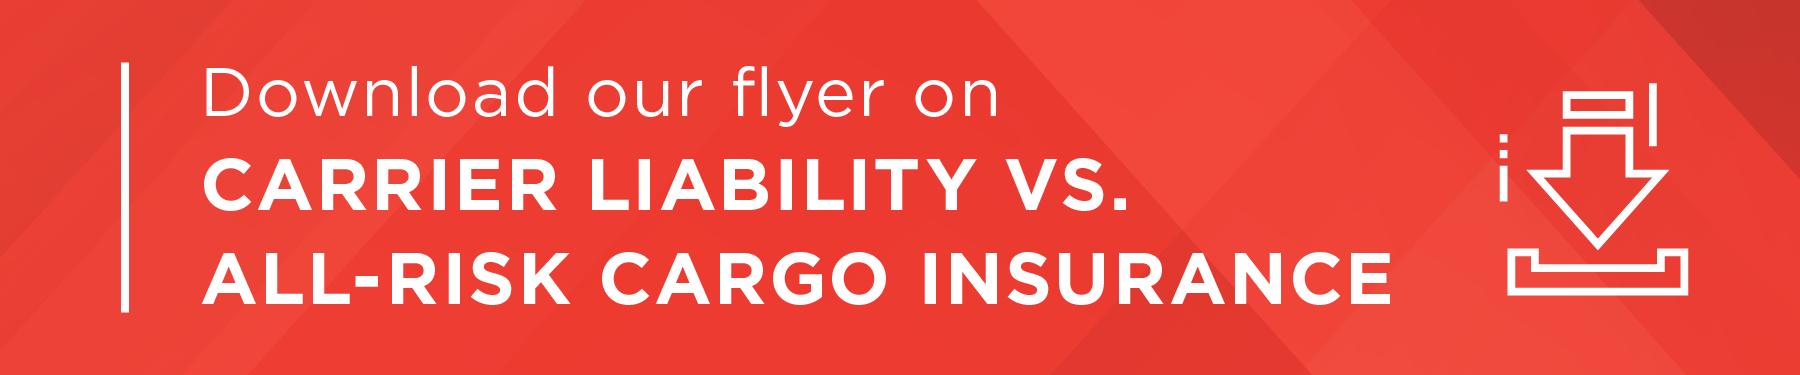 Carrier Liability vs. All-Risk CTA